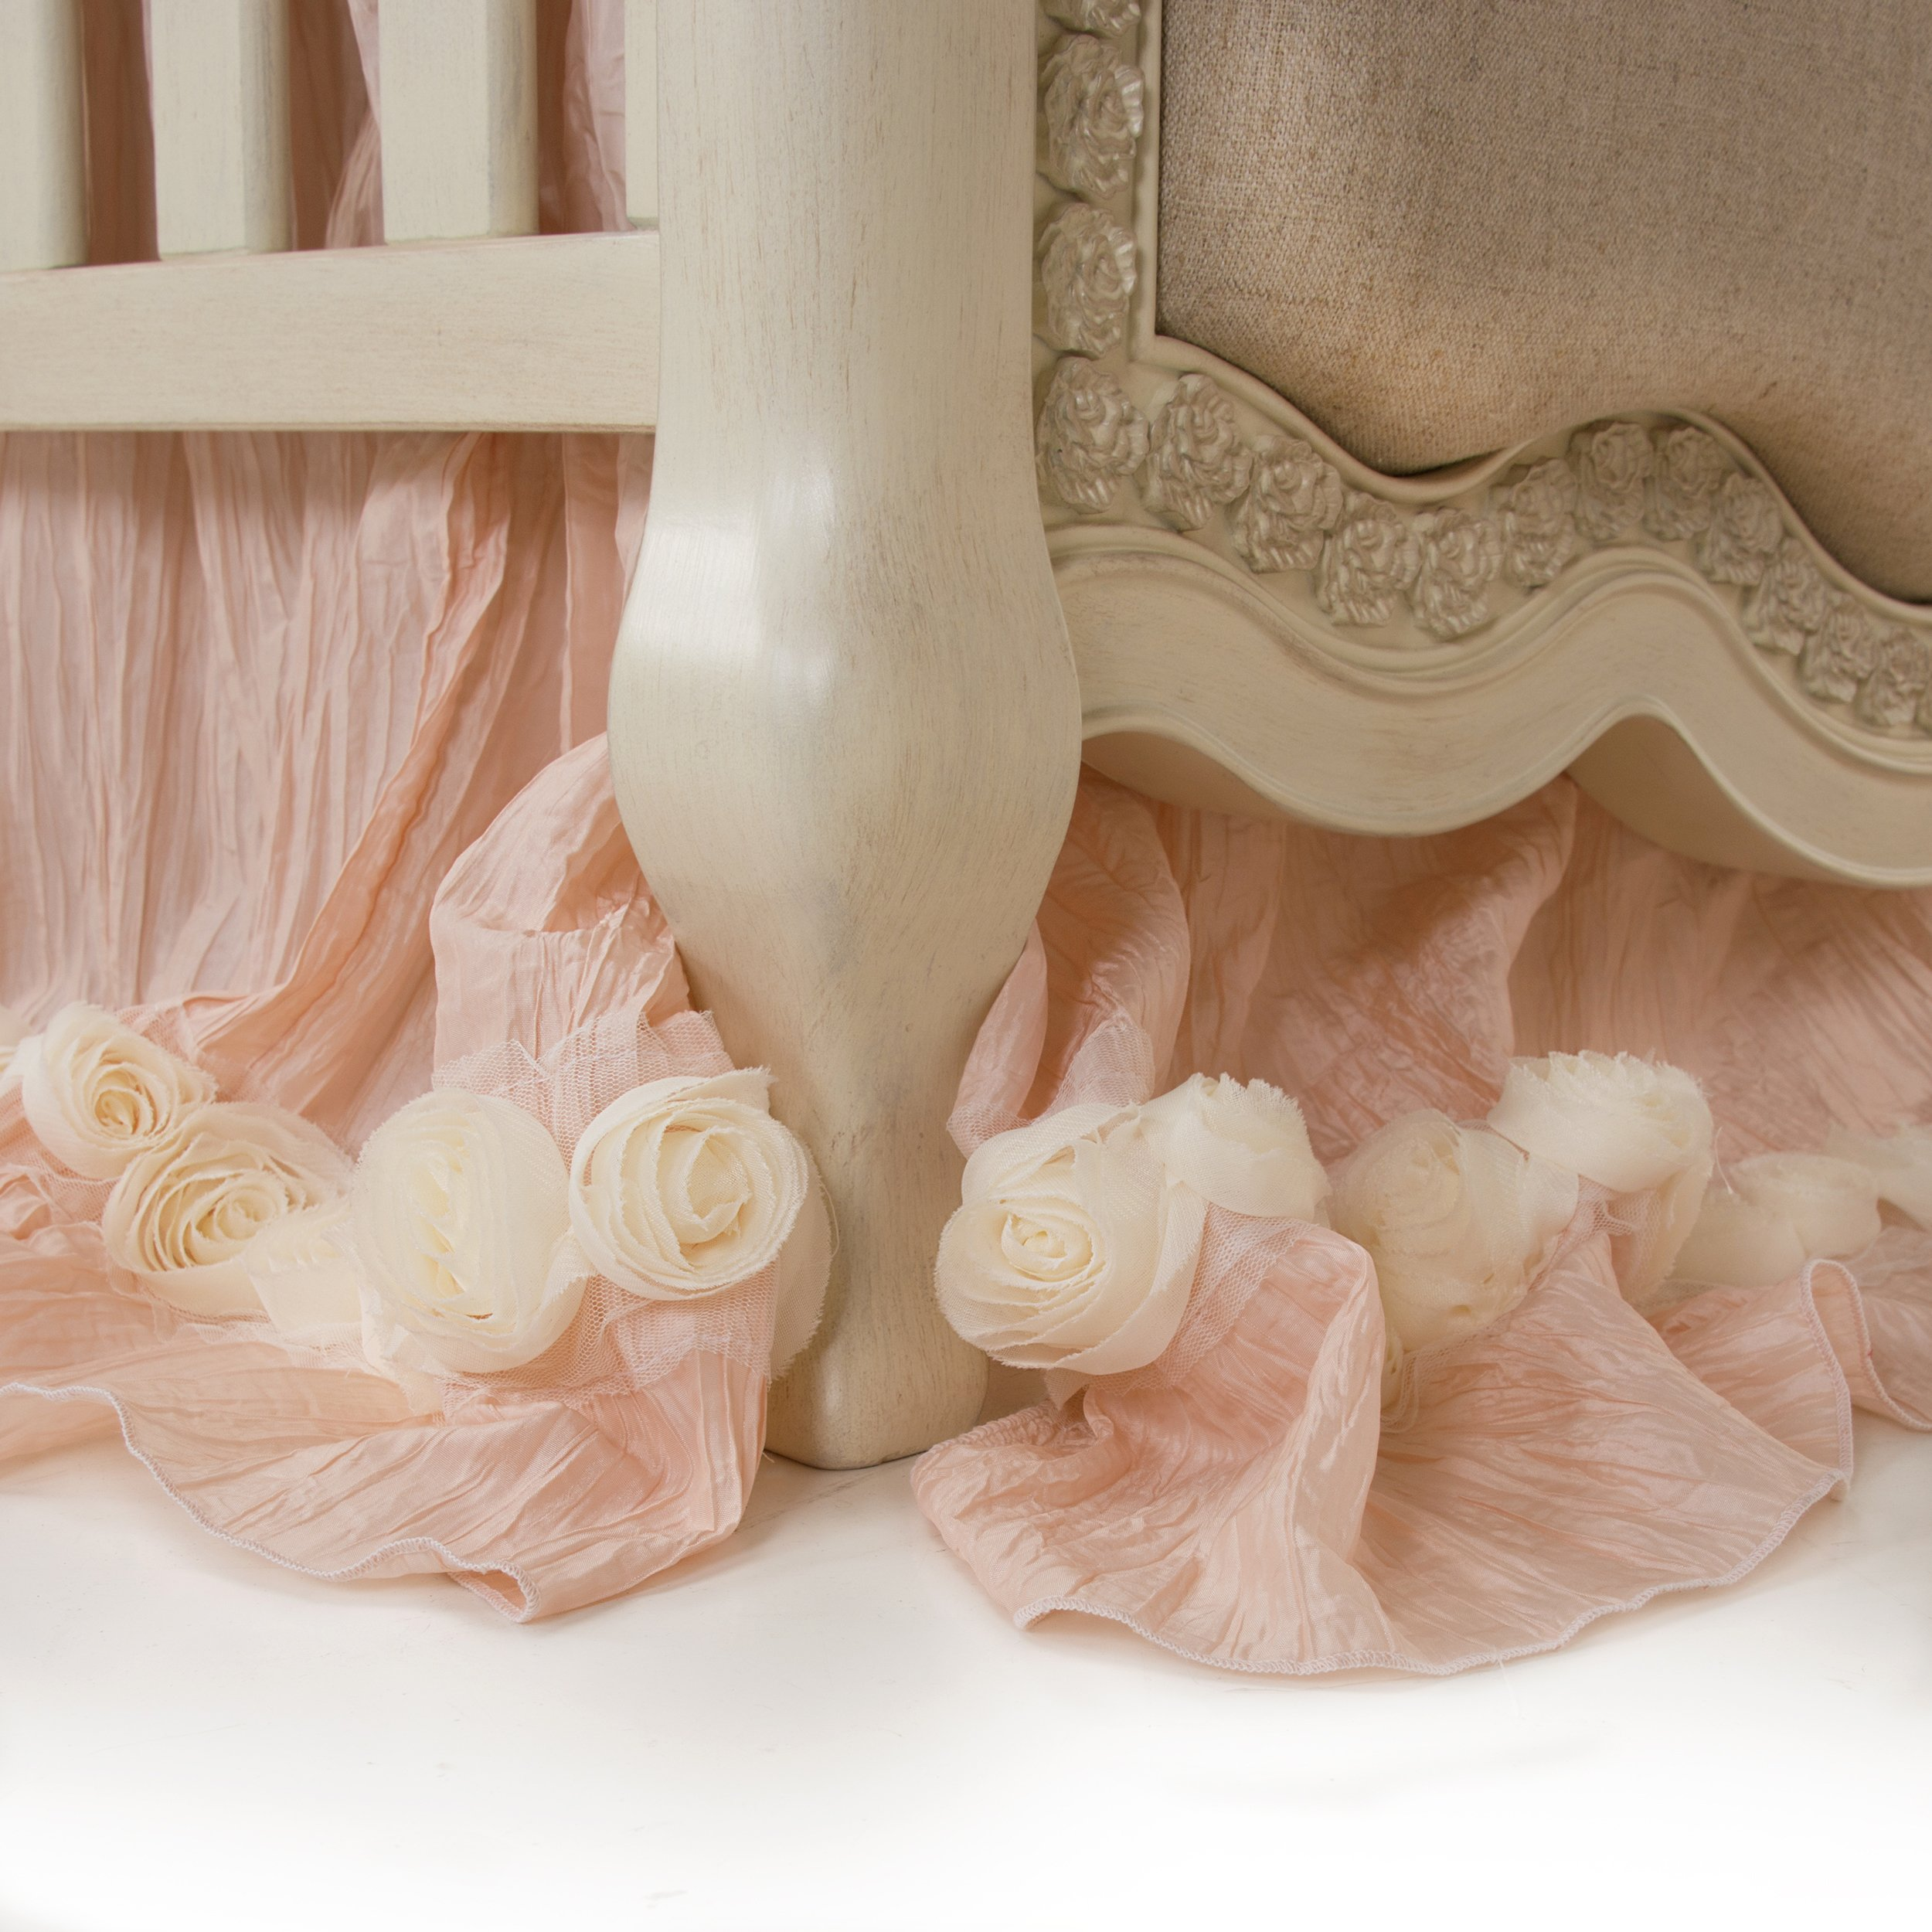 Glenna Jean Crib Skirt Contessa Dust Ruffle for Baby Nursery Crib by Glenna Jean